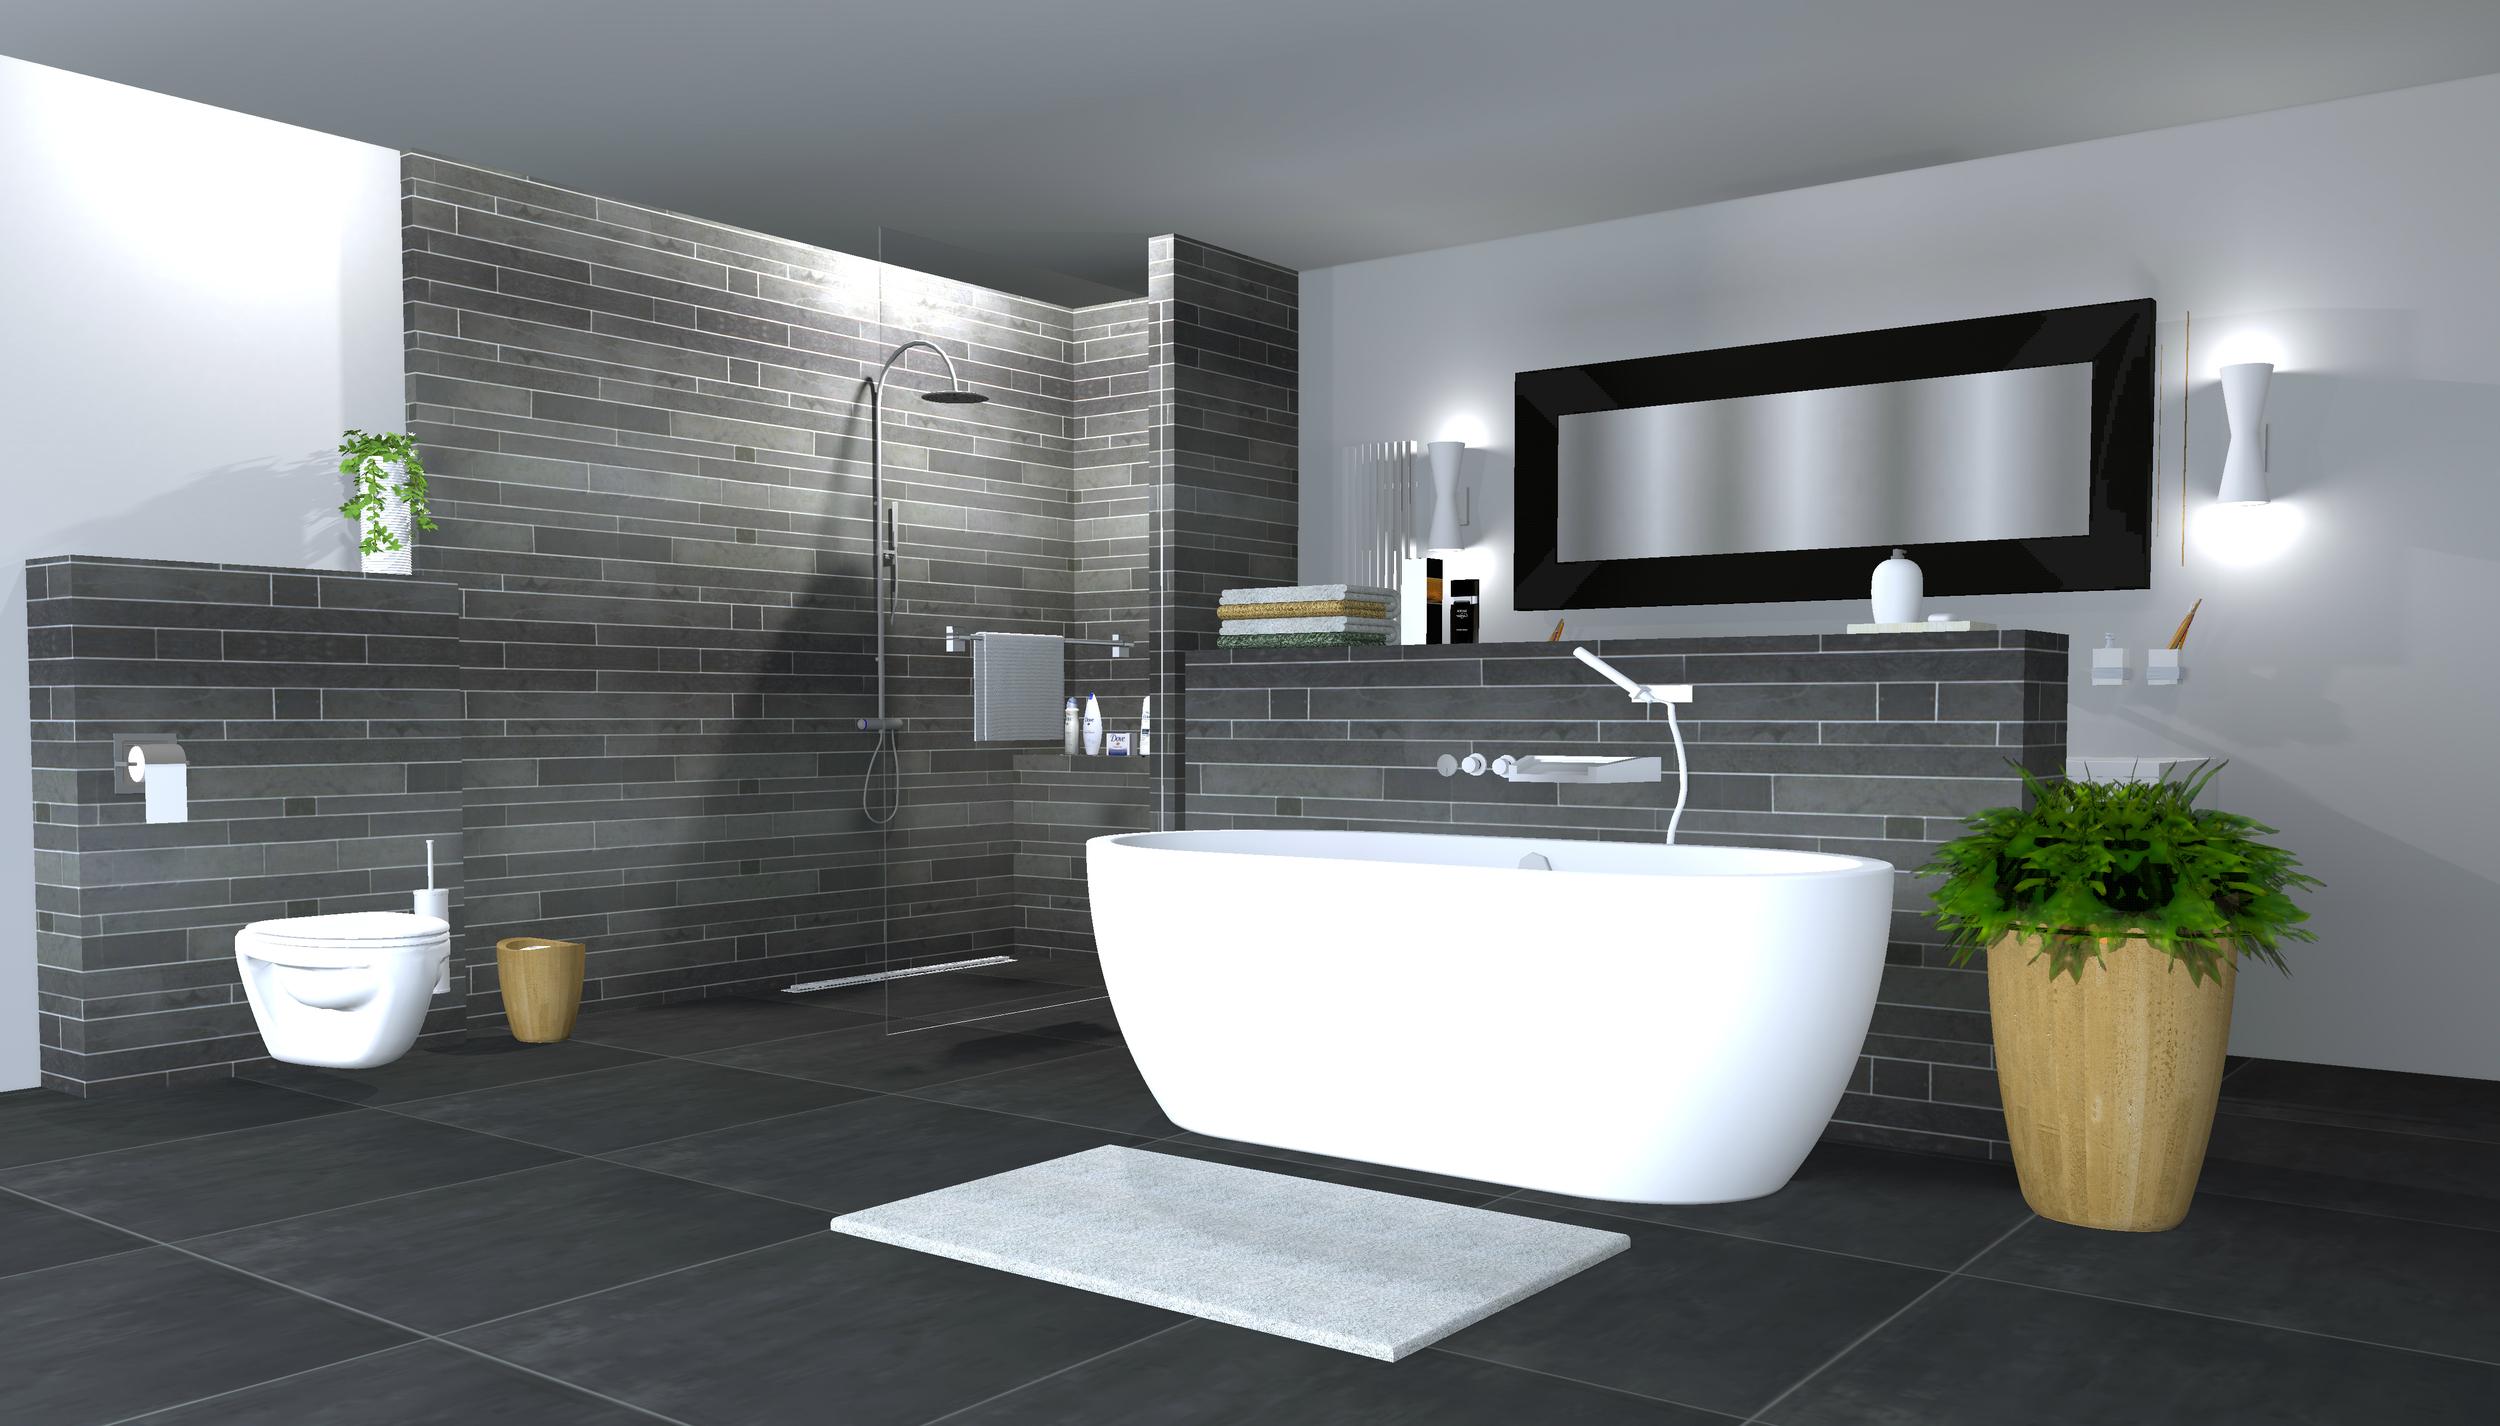 badkamer ontwerpen software mac - boisholz, Badkamer